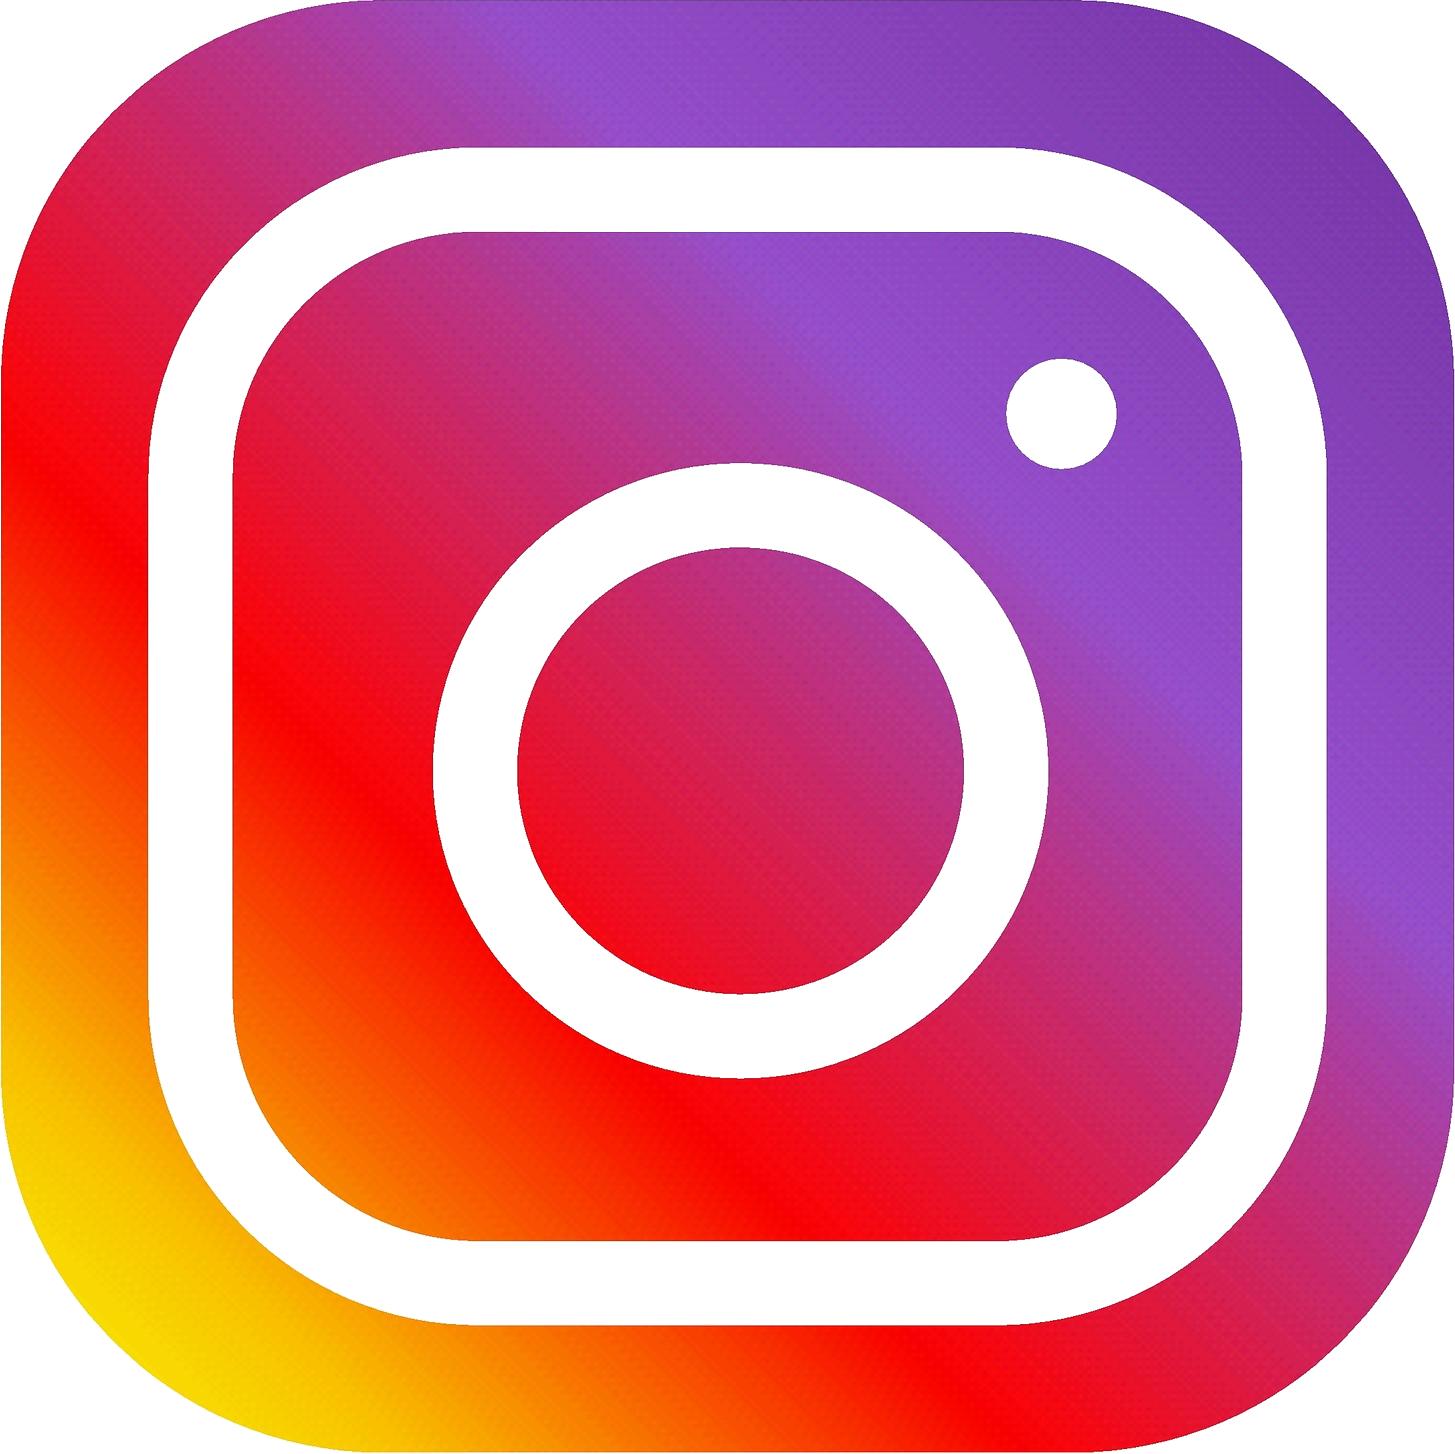 Instagram clipart, Instagram Transparent FREE for download ...